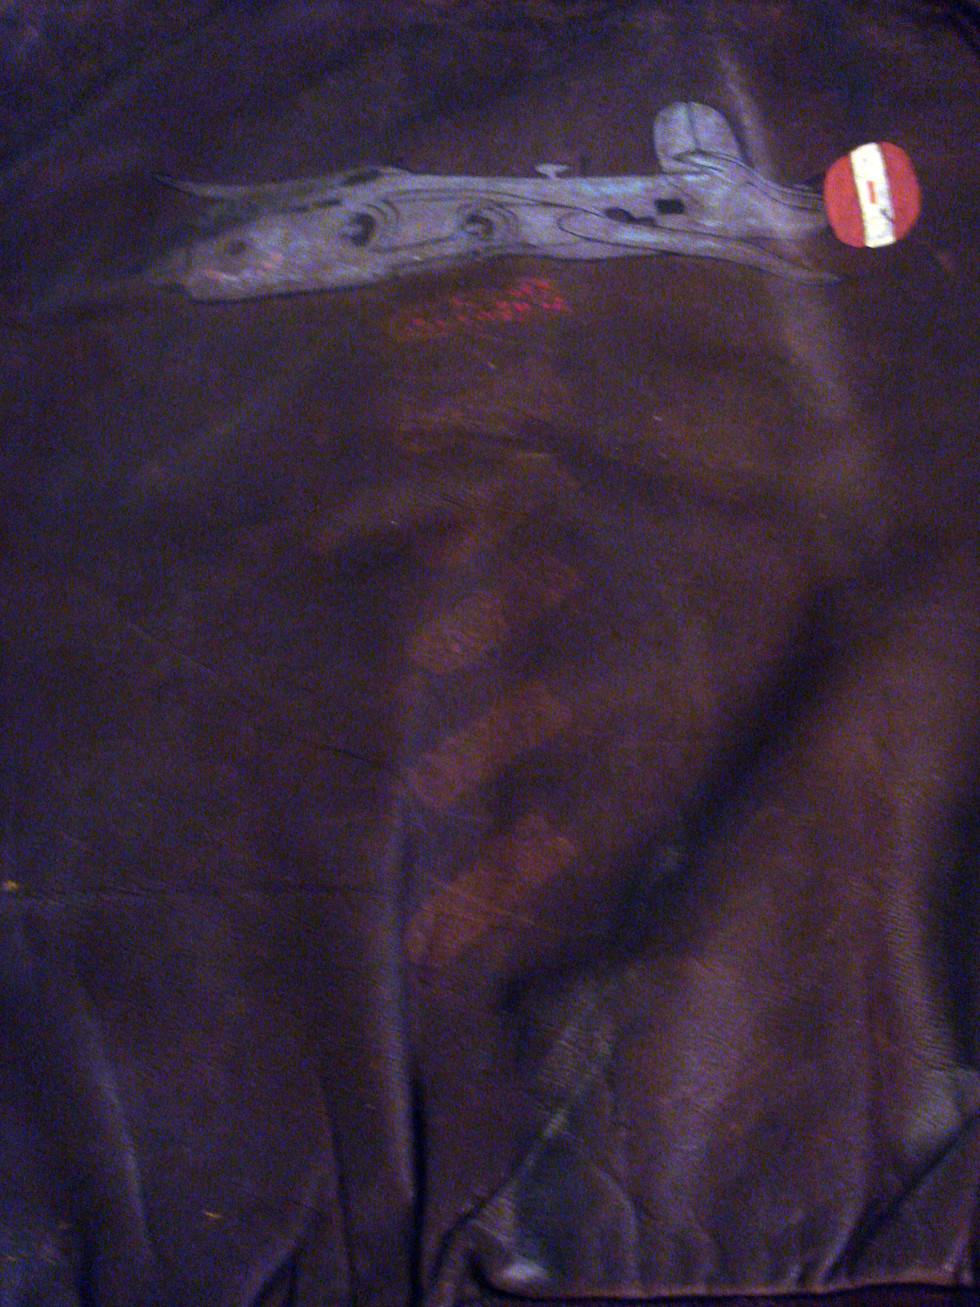 flight-jacket-painting_2701841121_o.jpg